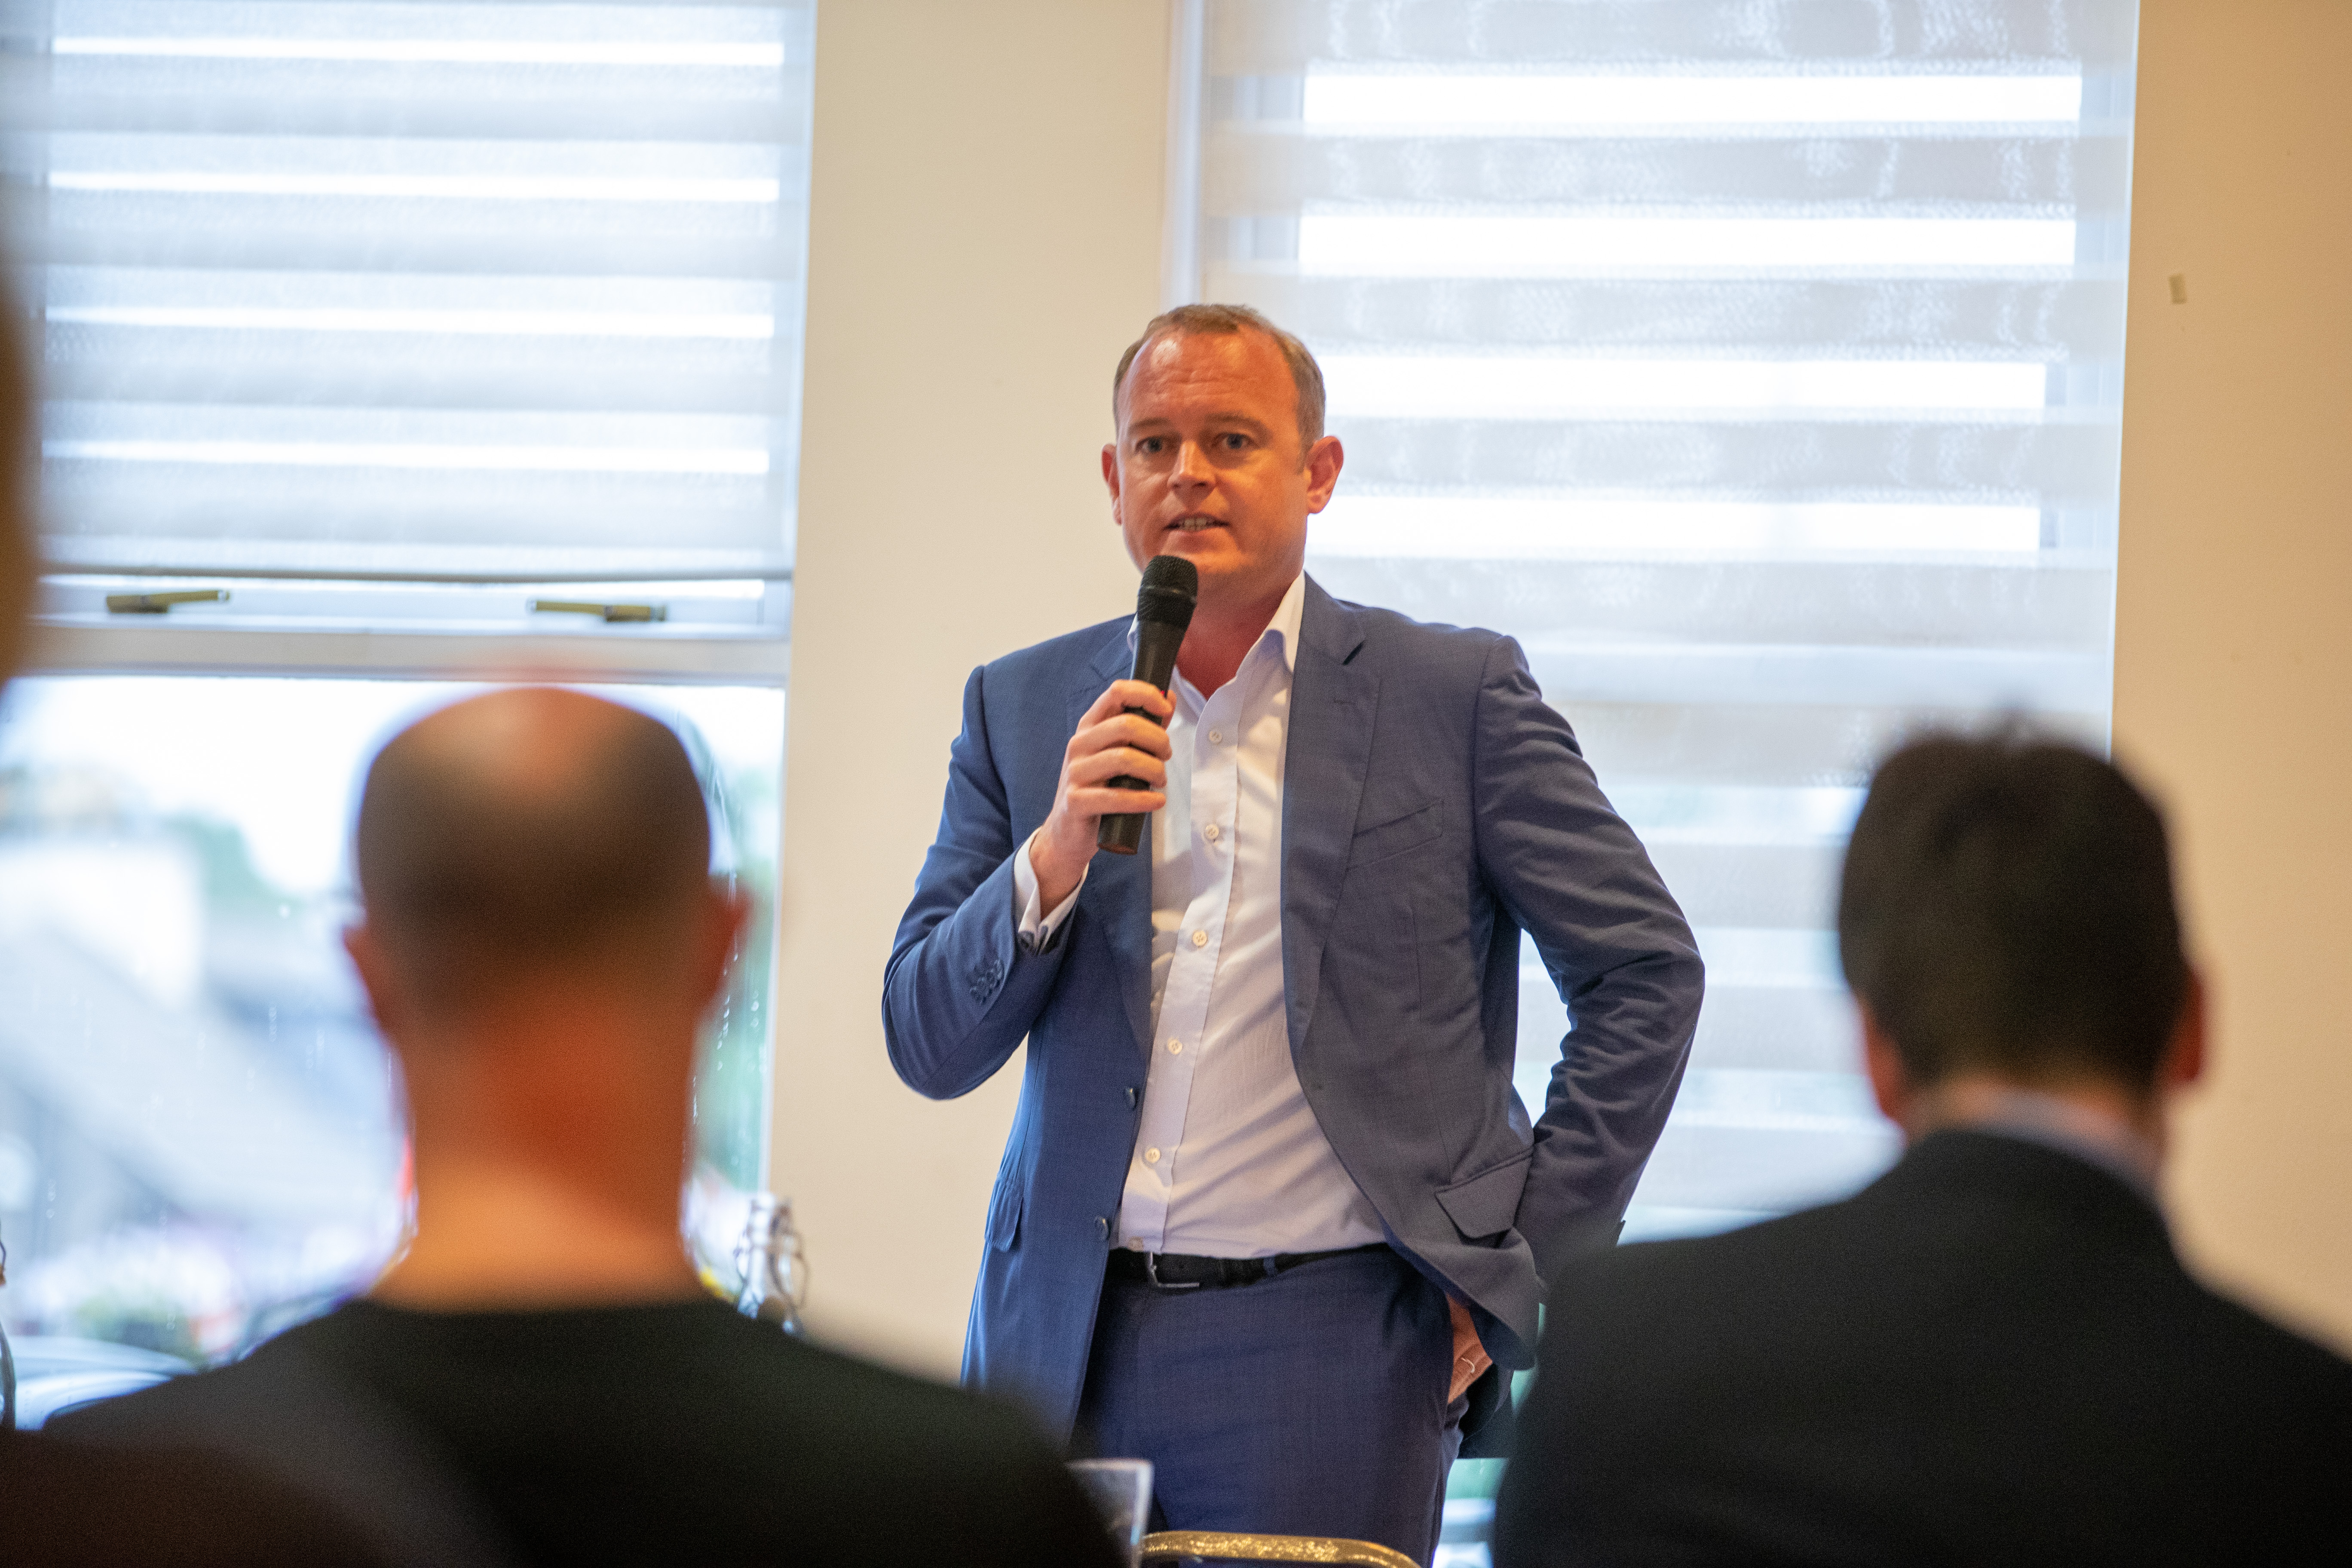 ScotRail chief executive Alex Hynes.